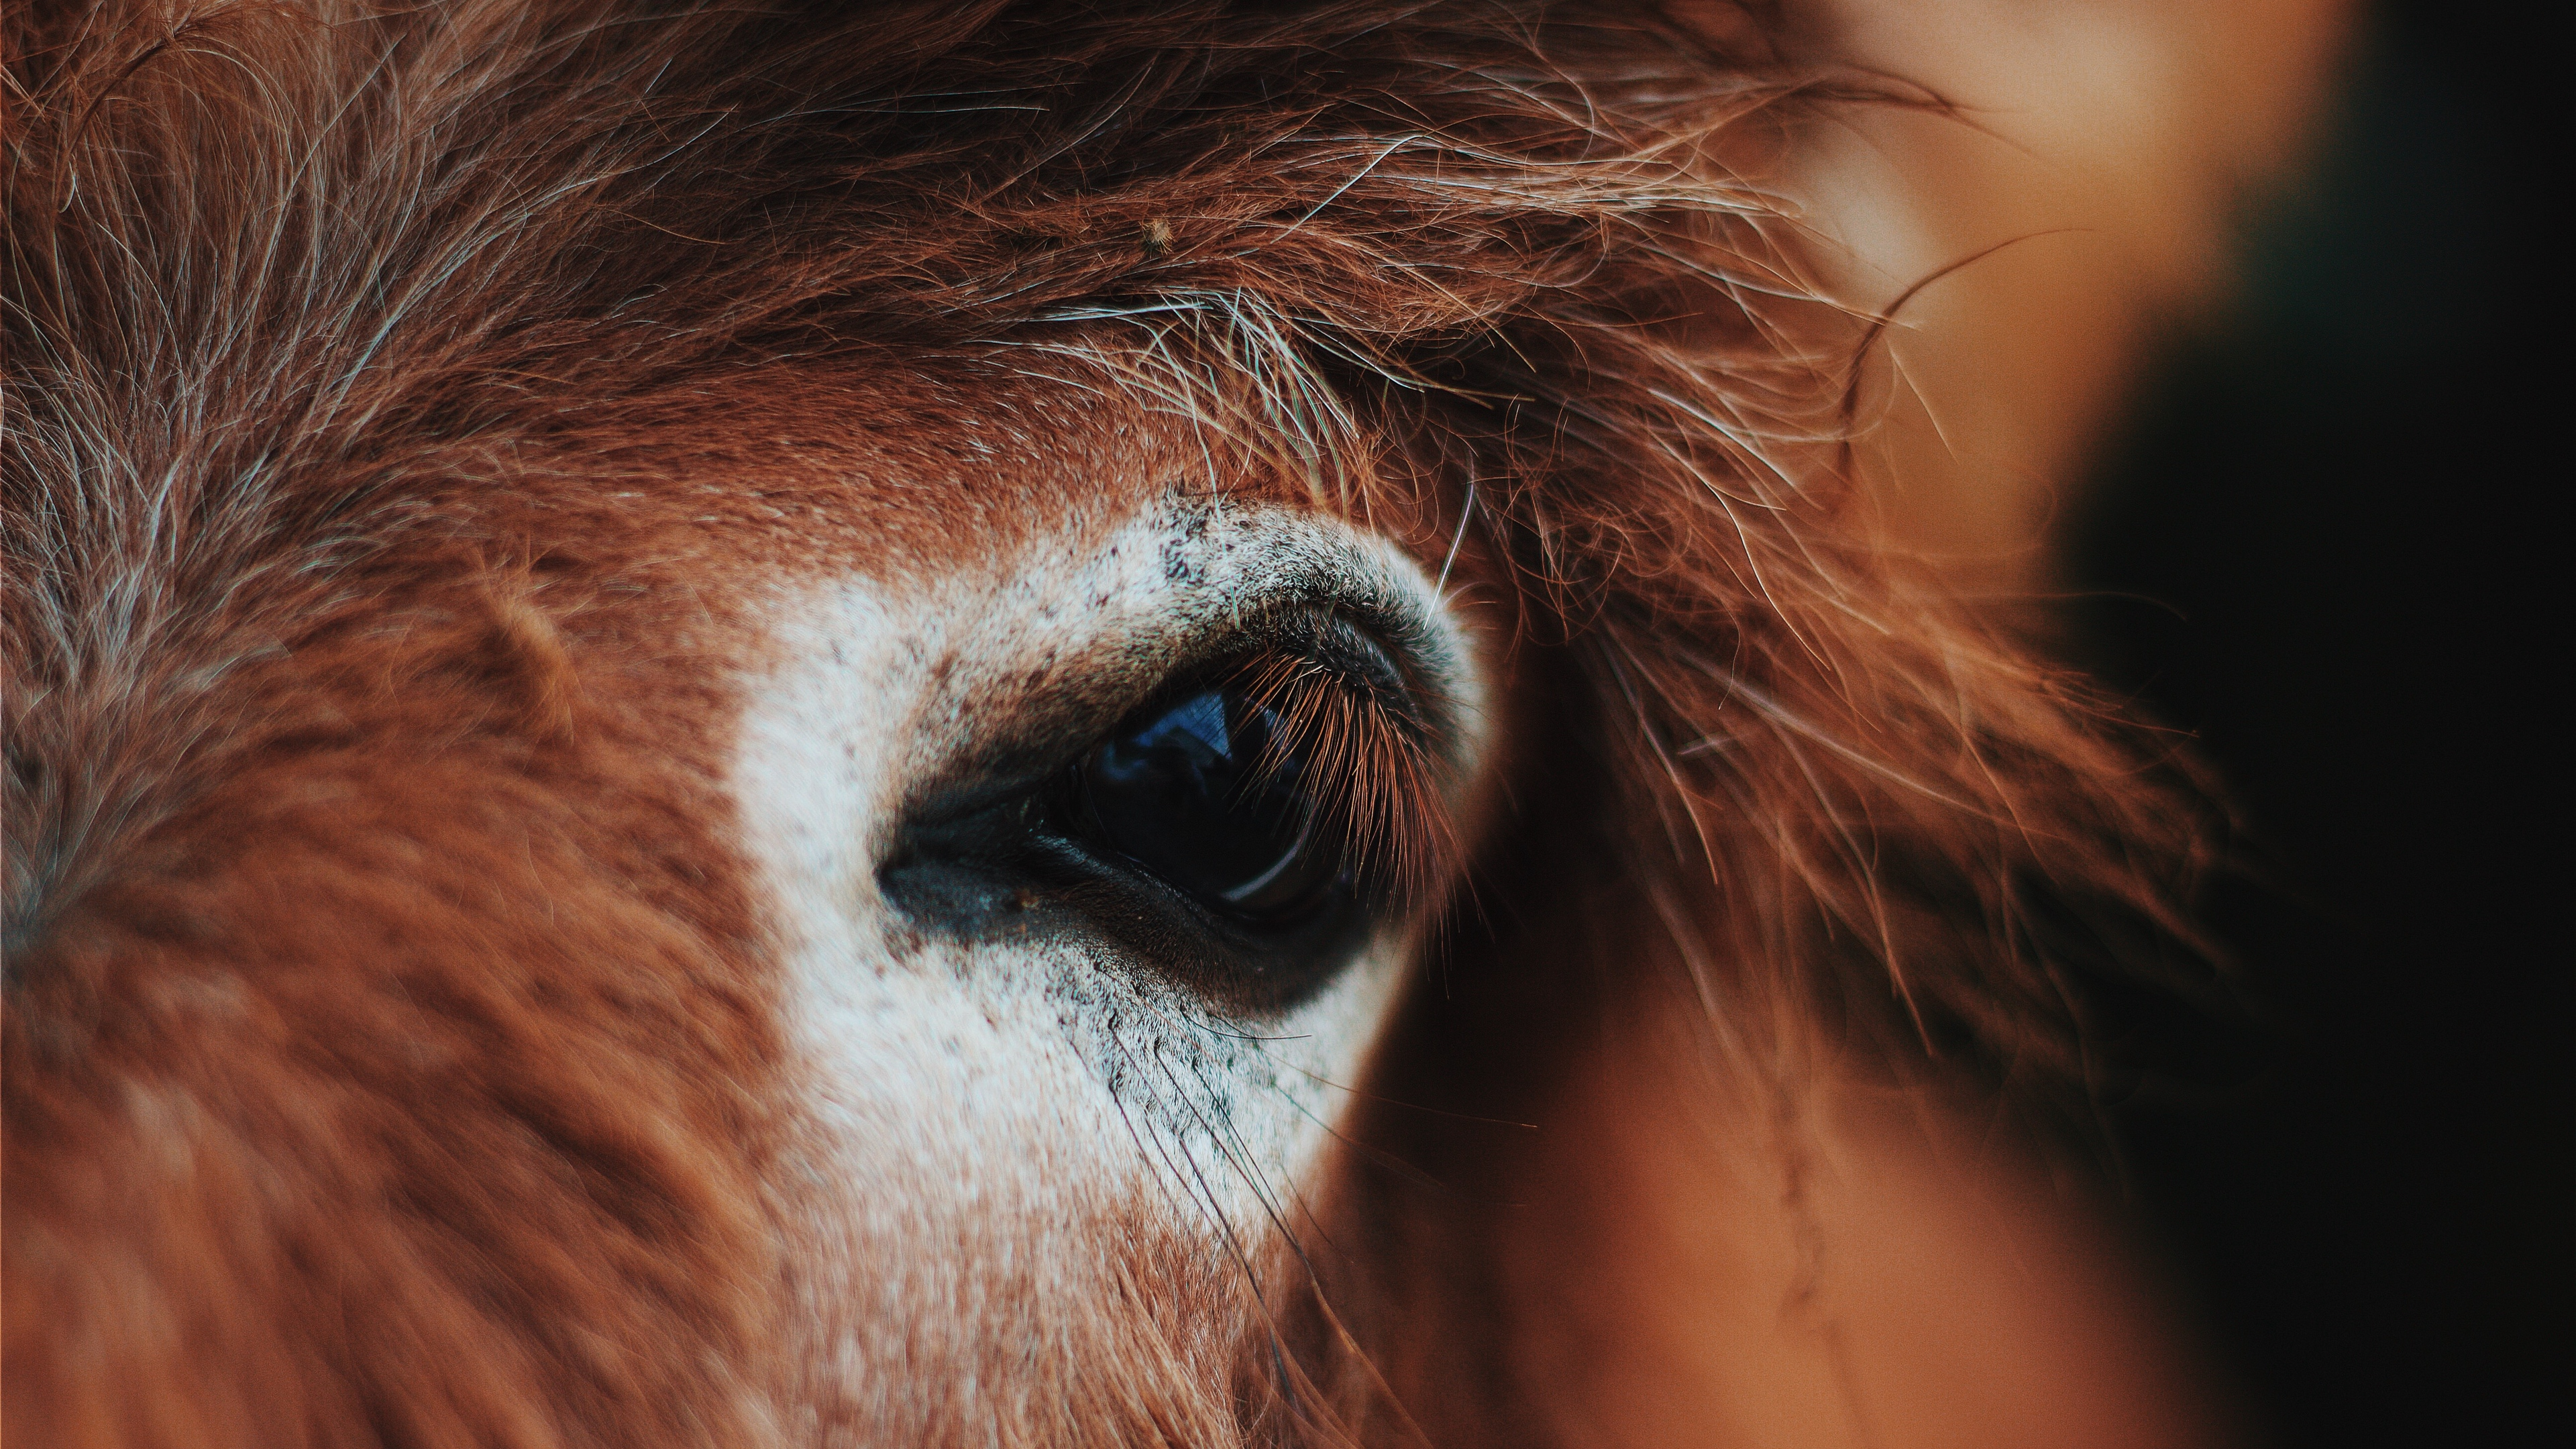 horse eye mane eyelashes 4k 1542243039 - horse, eye, mane, eyelashes 4k - mane, horse, Eye